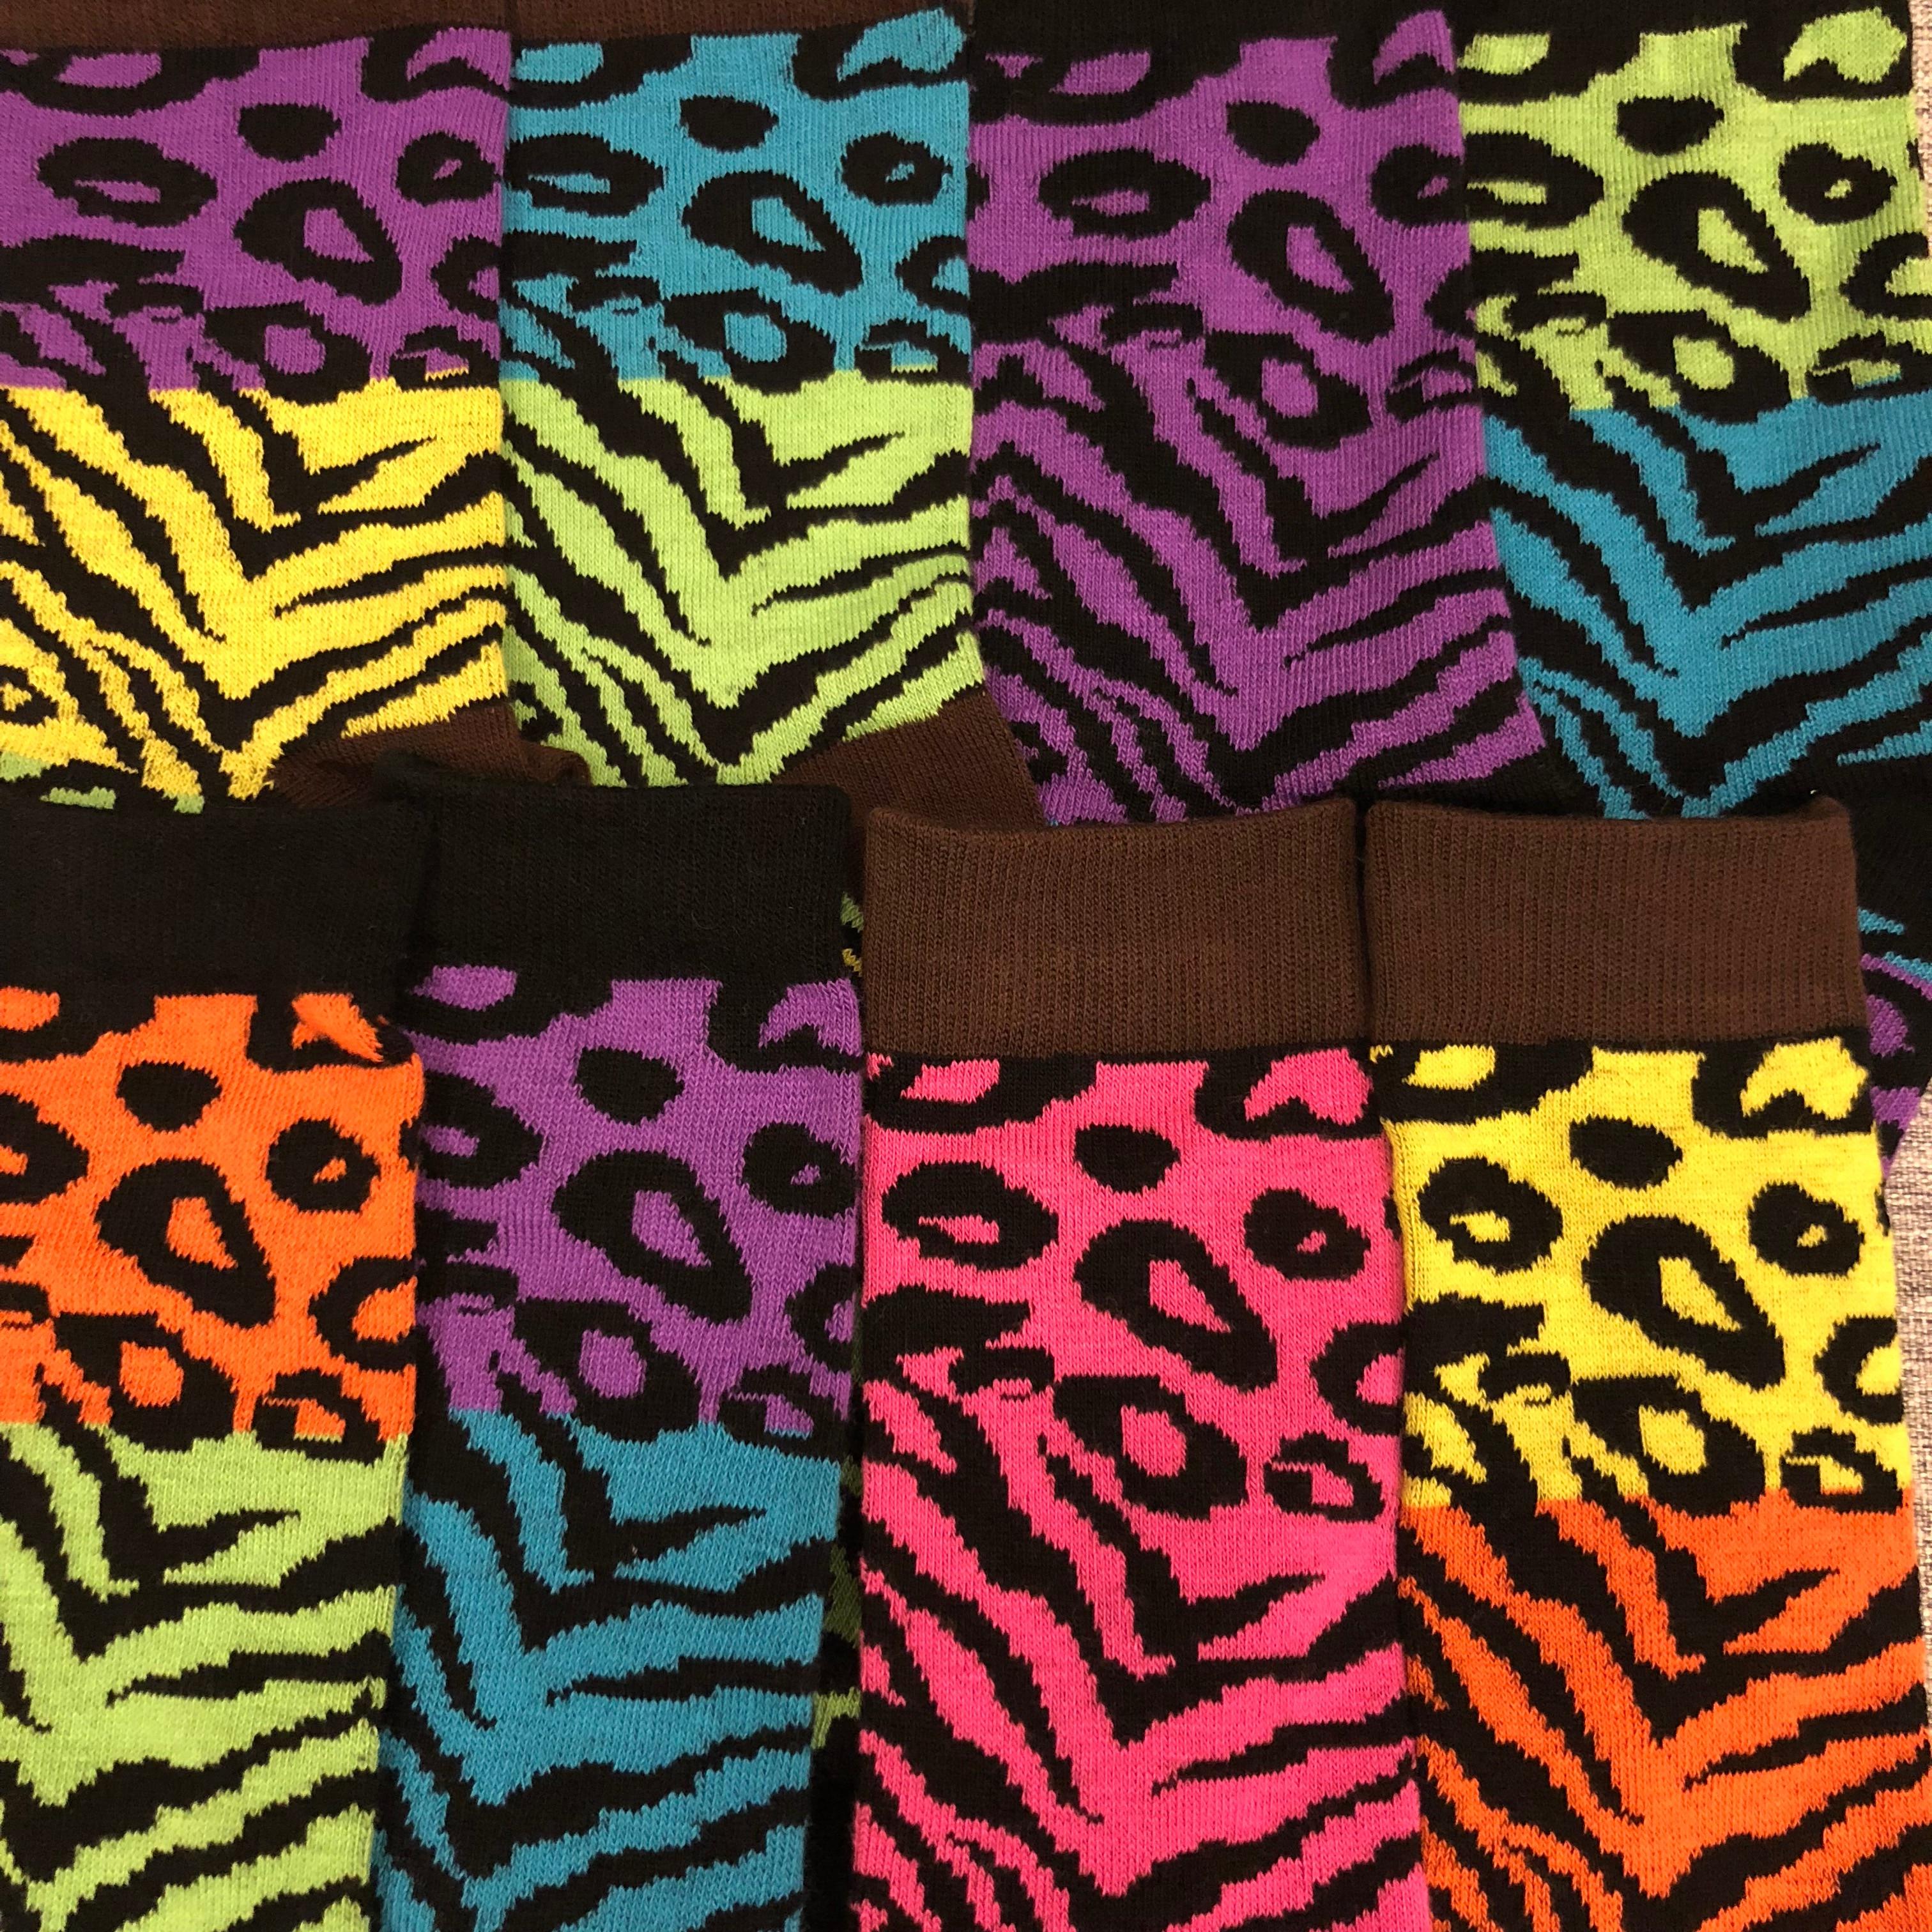 Adult Size Crew AB Different Socks Fashion King Leopard Zebra Tiger Stripe Differ Wild Animal Motif Print Mosaic Camouflage Camo